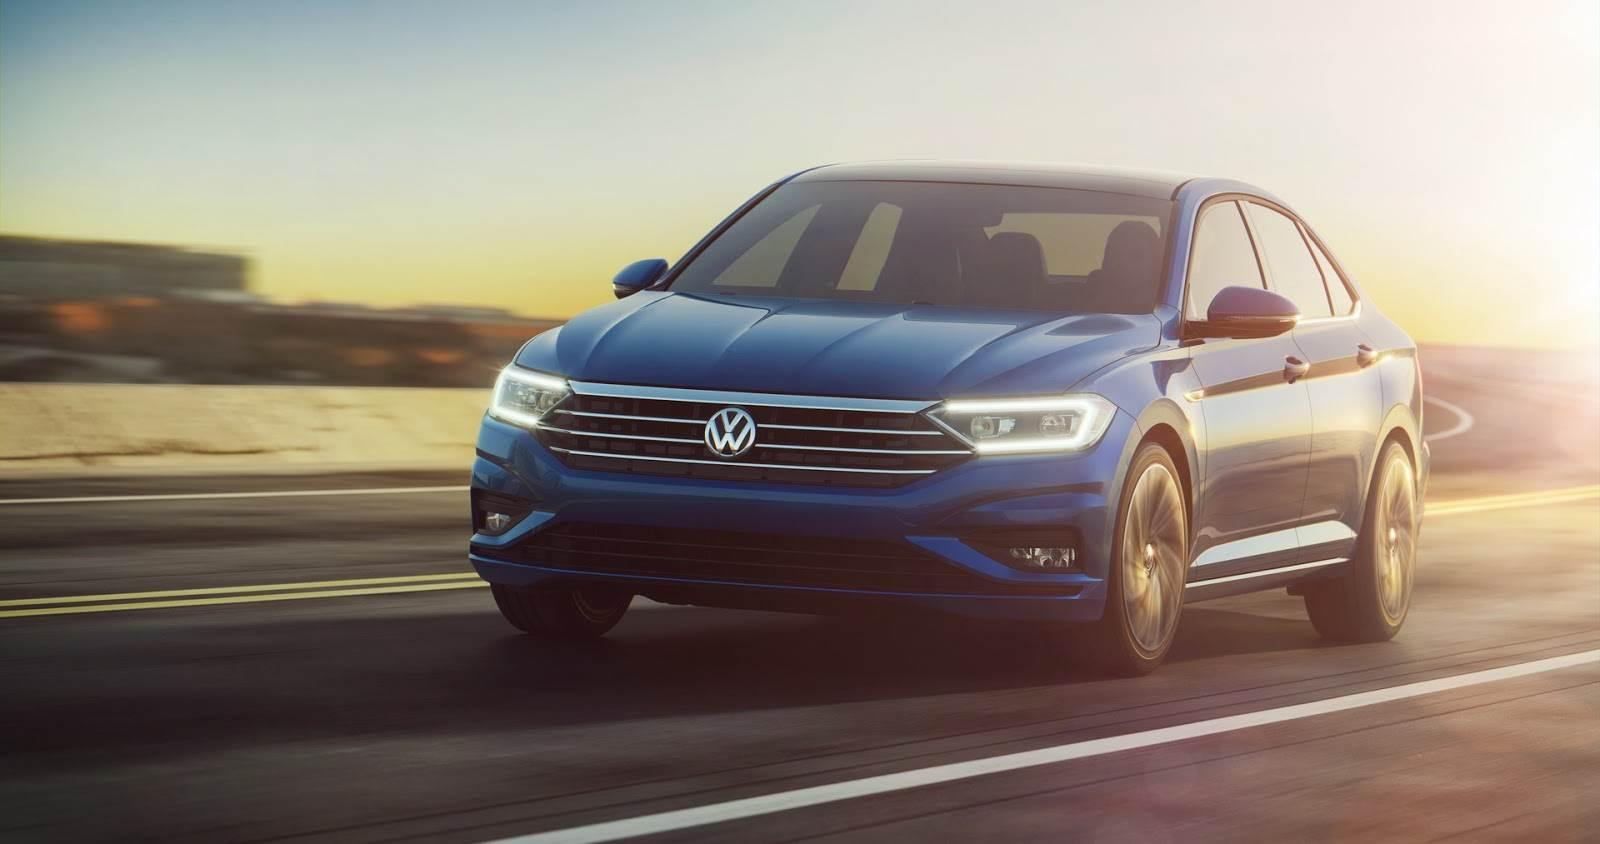 2018 Volkswagen Jetta Interior And Exterior Images India